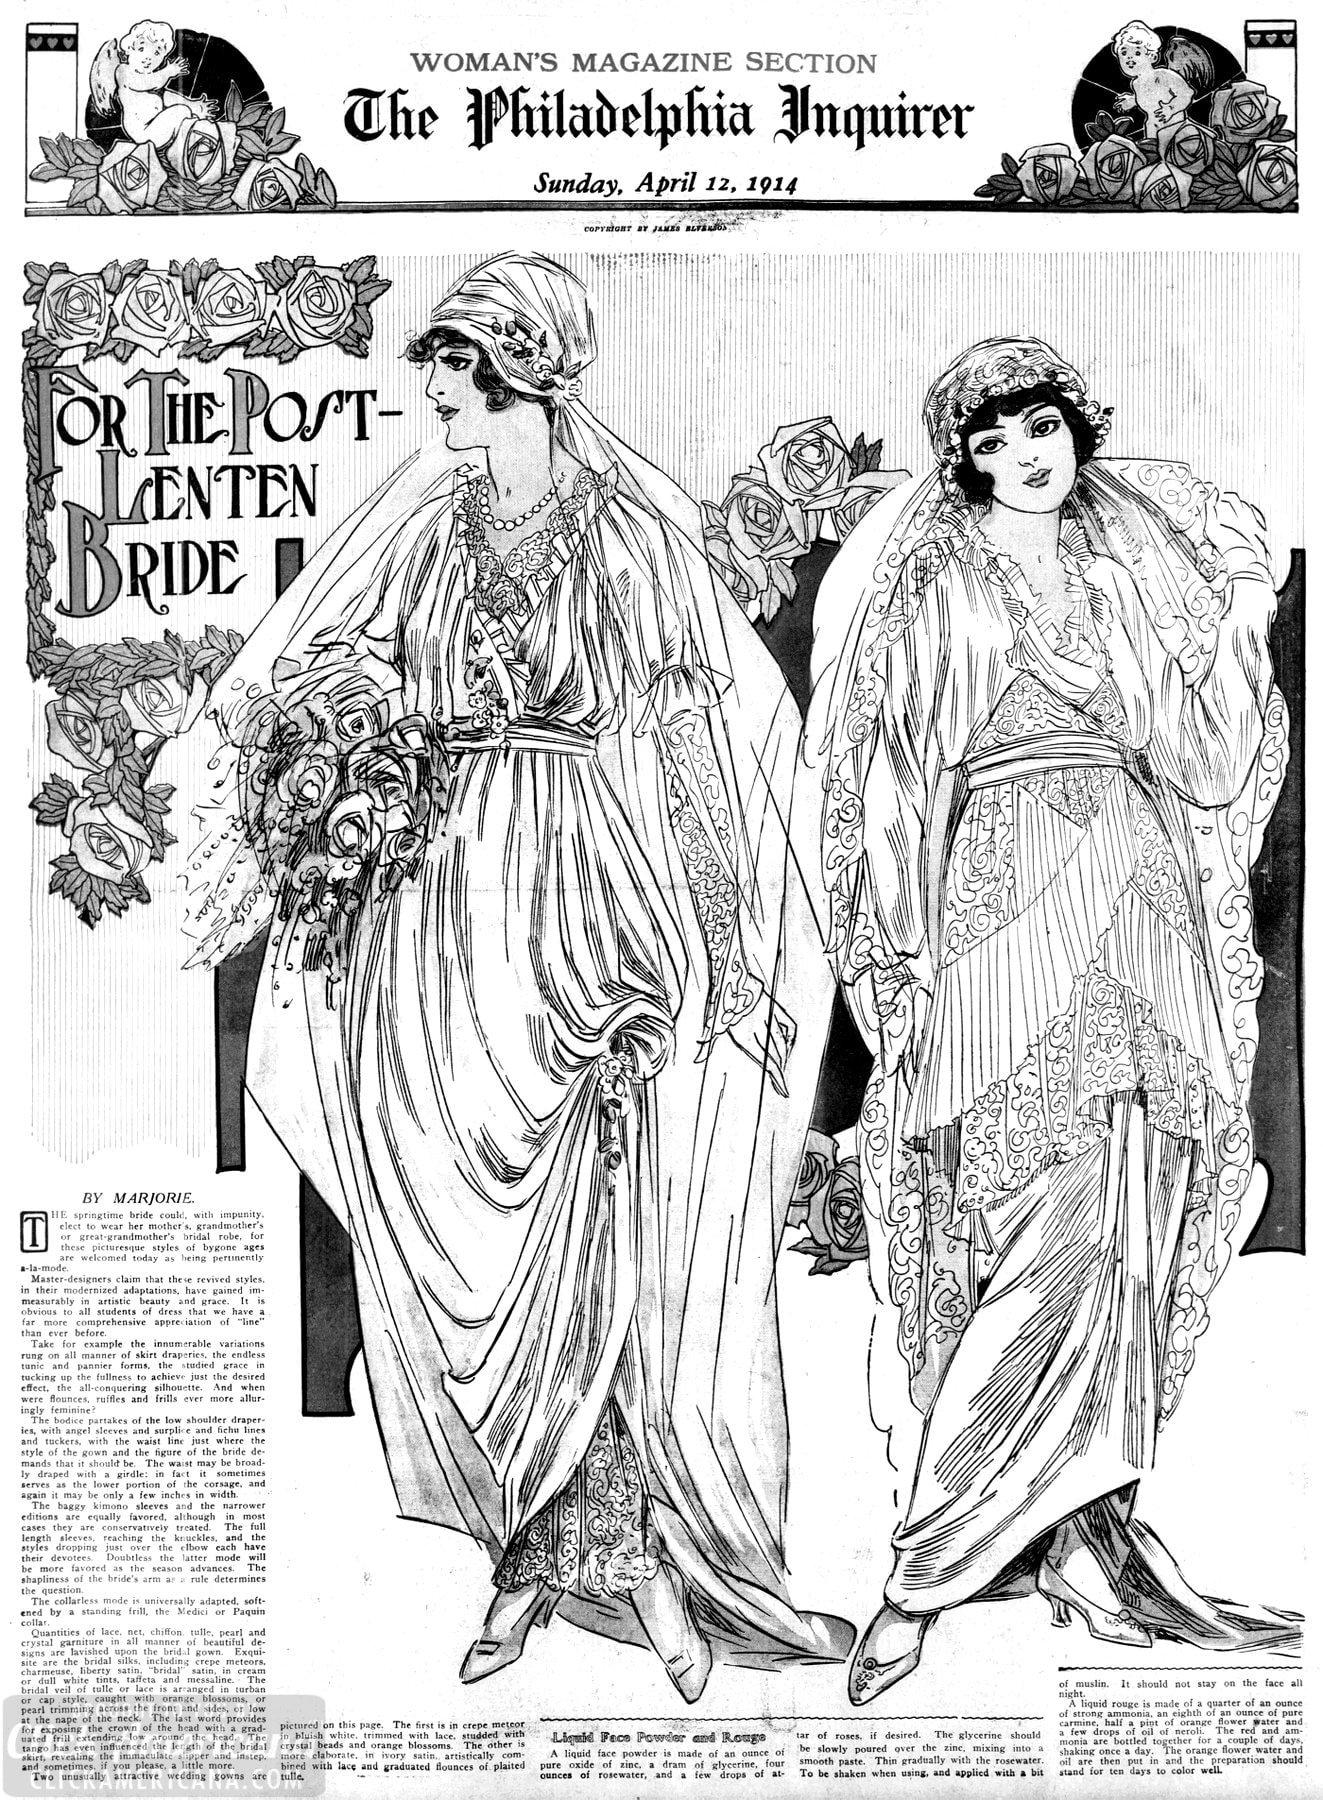 Fashionable, stunning and stylish vintage wedding dresses from 1914